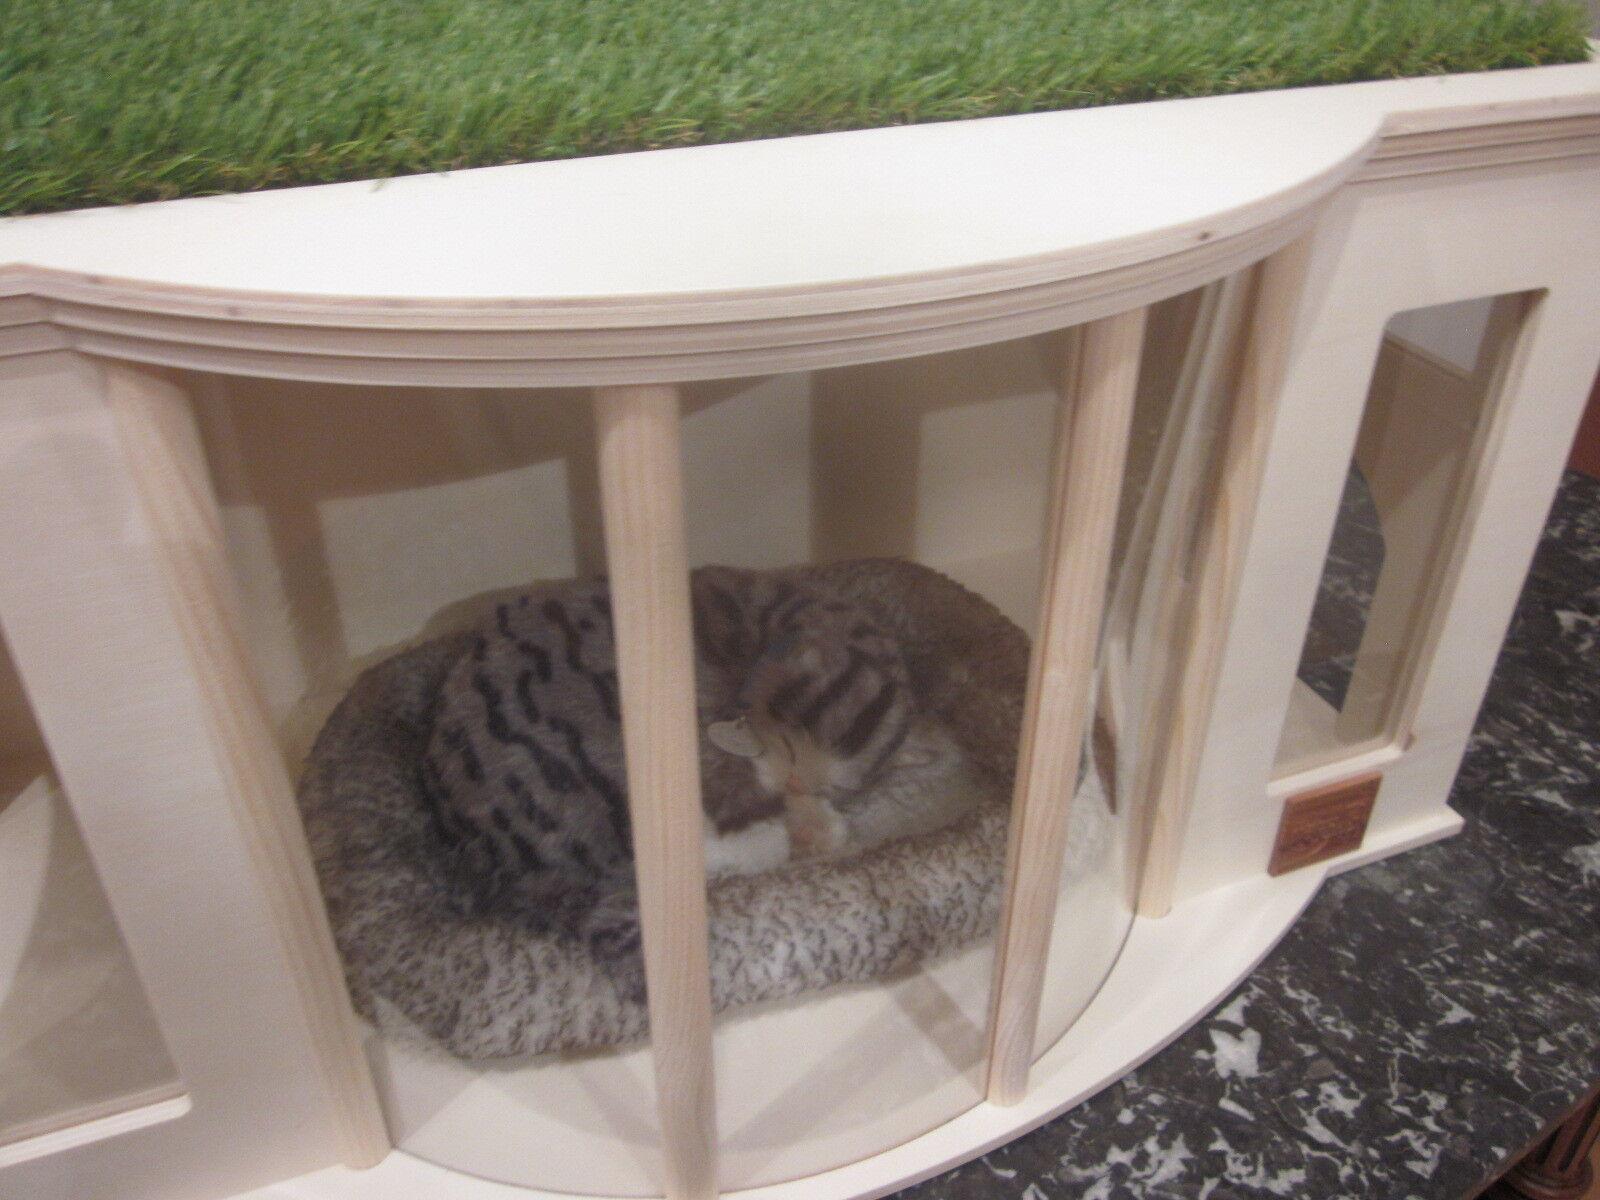 neu holz villa katzenhaus katzenbett katzenh tte hundebett chihuahua hundeh tte eur 84 00. Black Bedroom Furniture Sets. Home Design Ideas